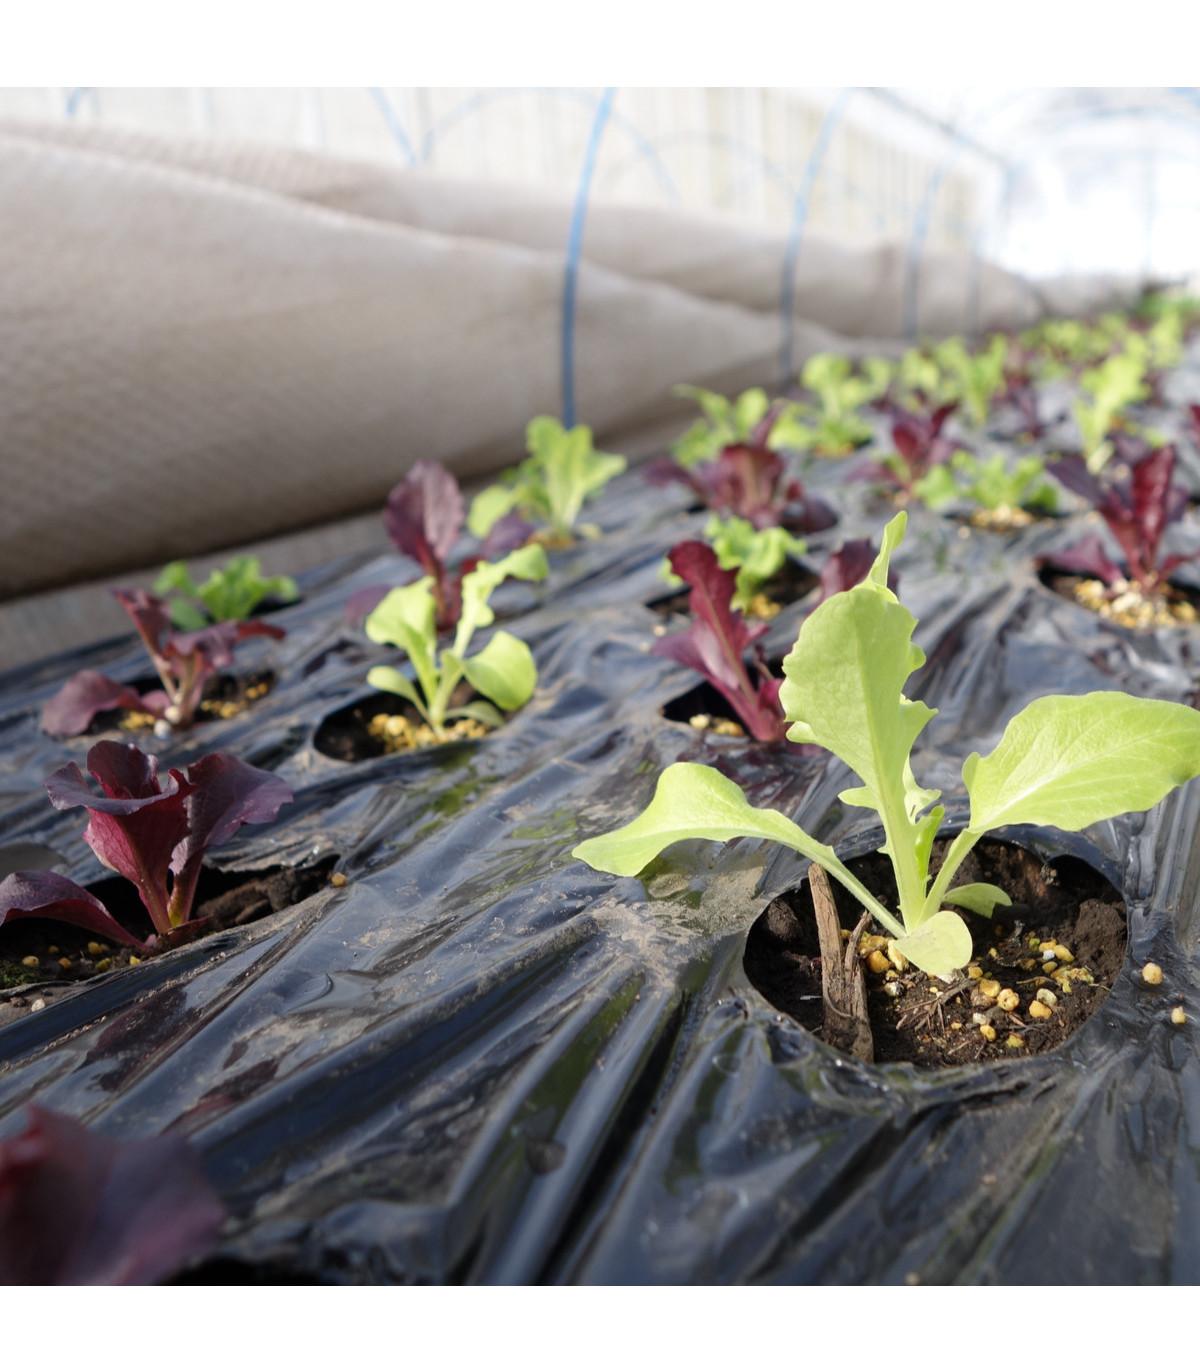 Šalát na balkón Baby leaf - Lactuca sativa - semená - 100 ks